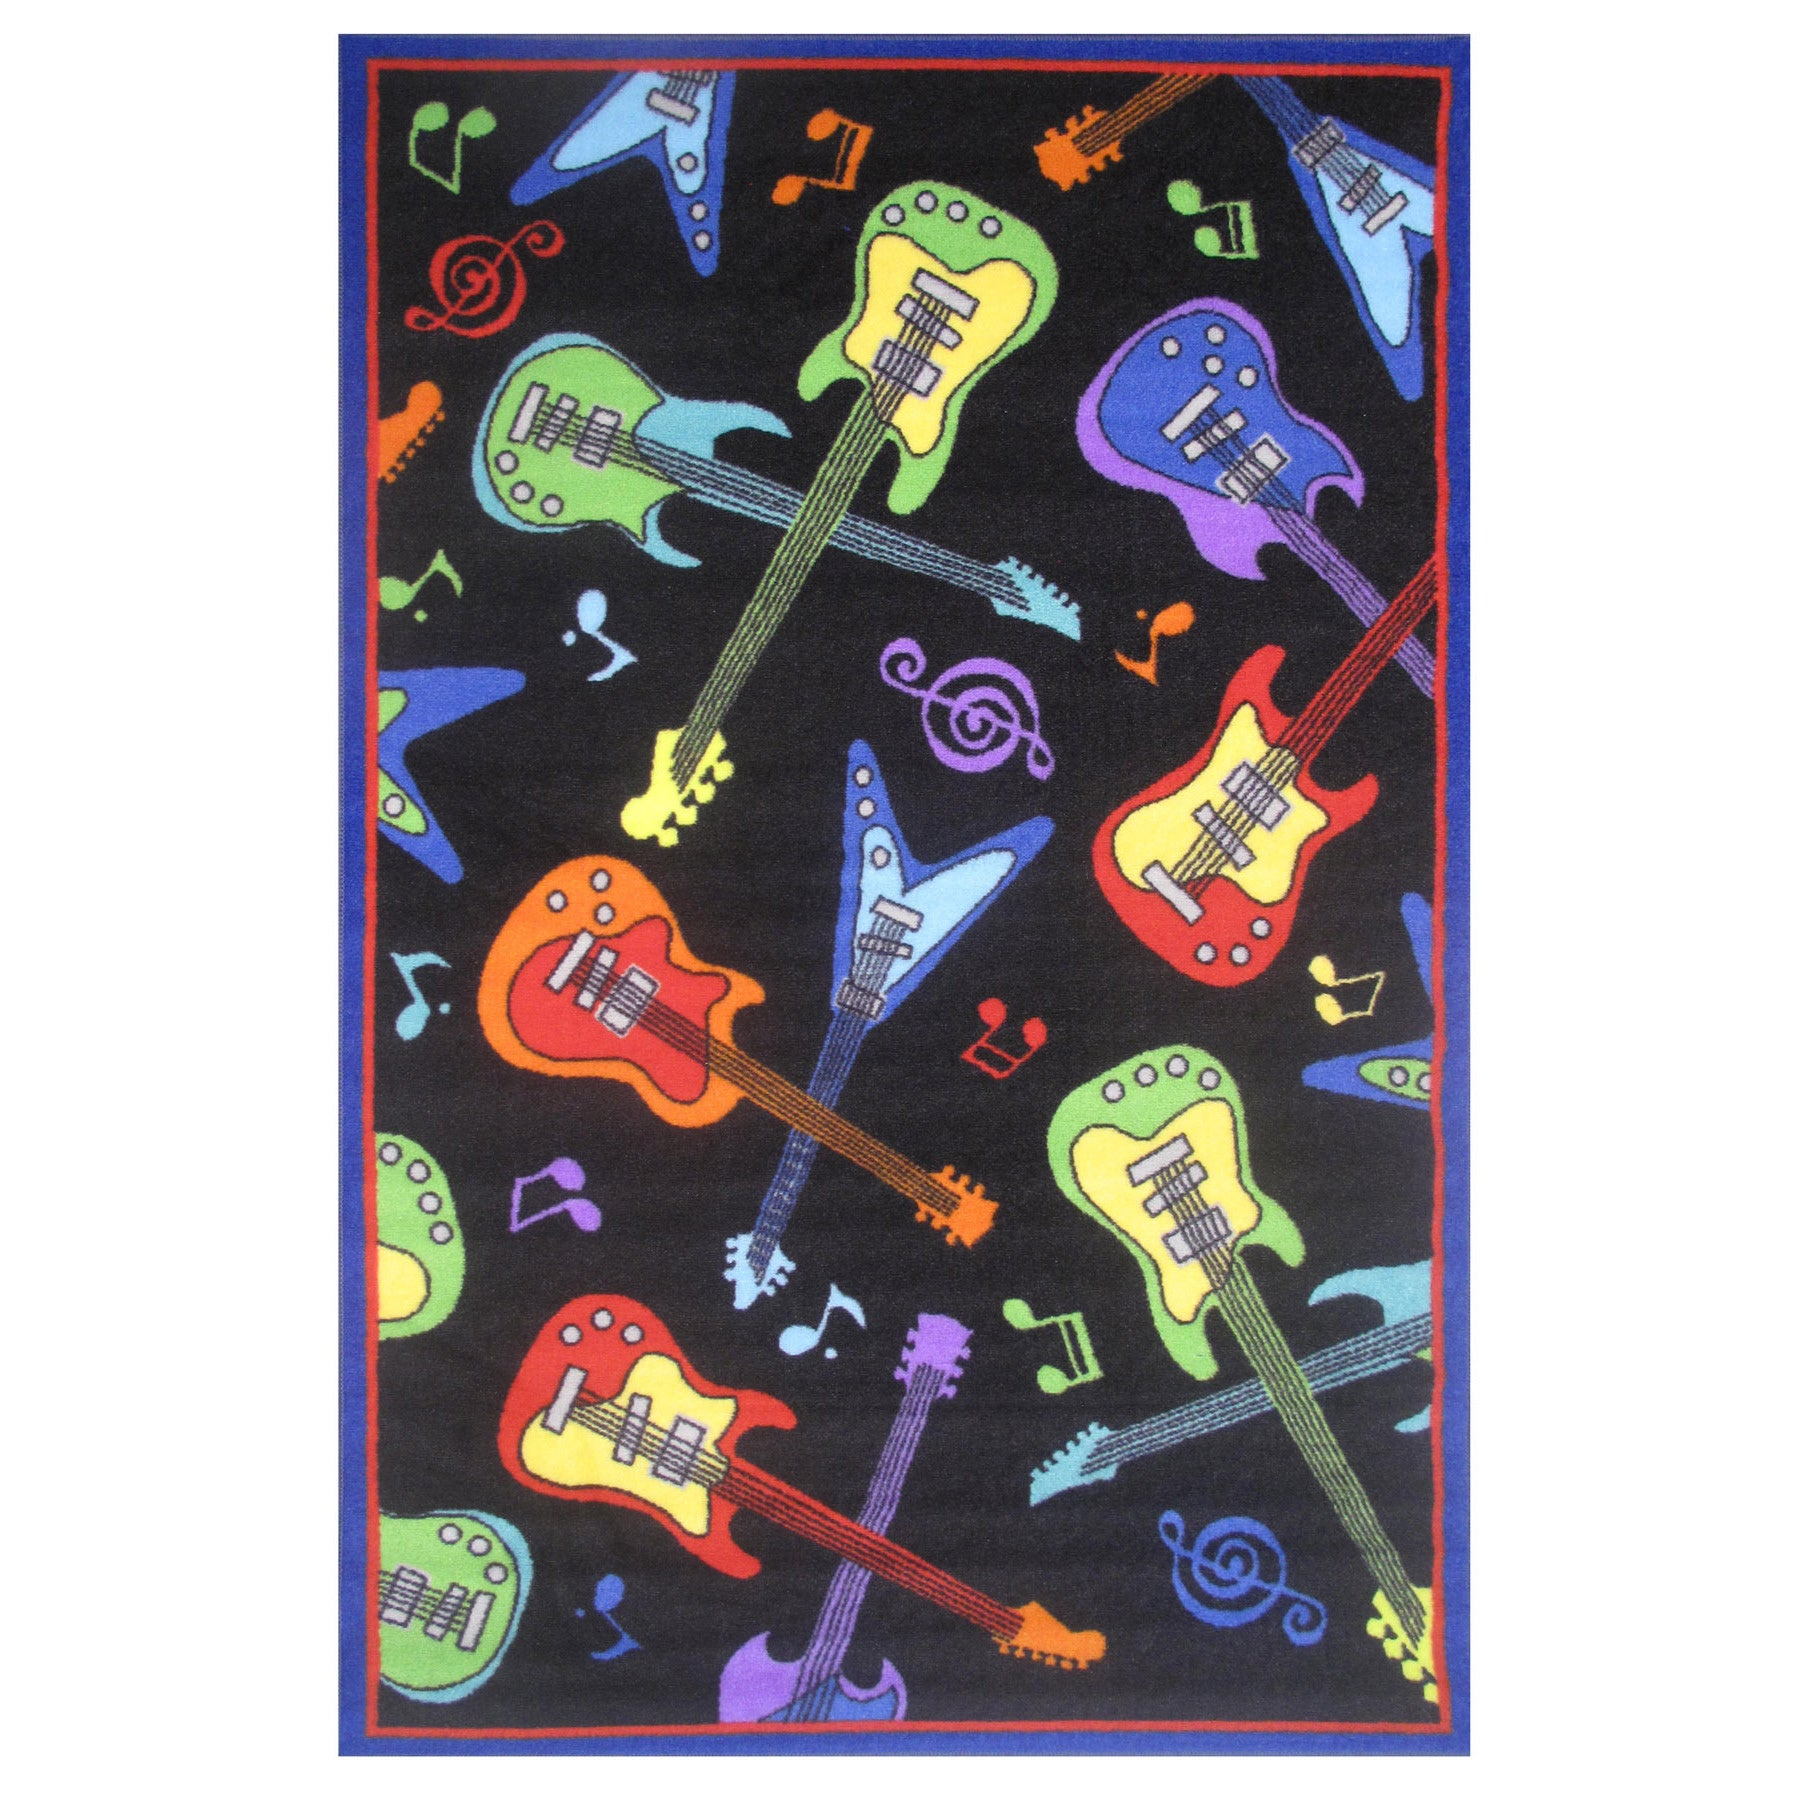 LA RUG Guitars Black Accent Rug (1'6 x 2'4) (19 inch x 29...